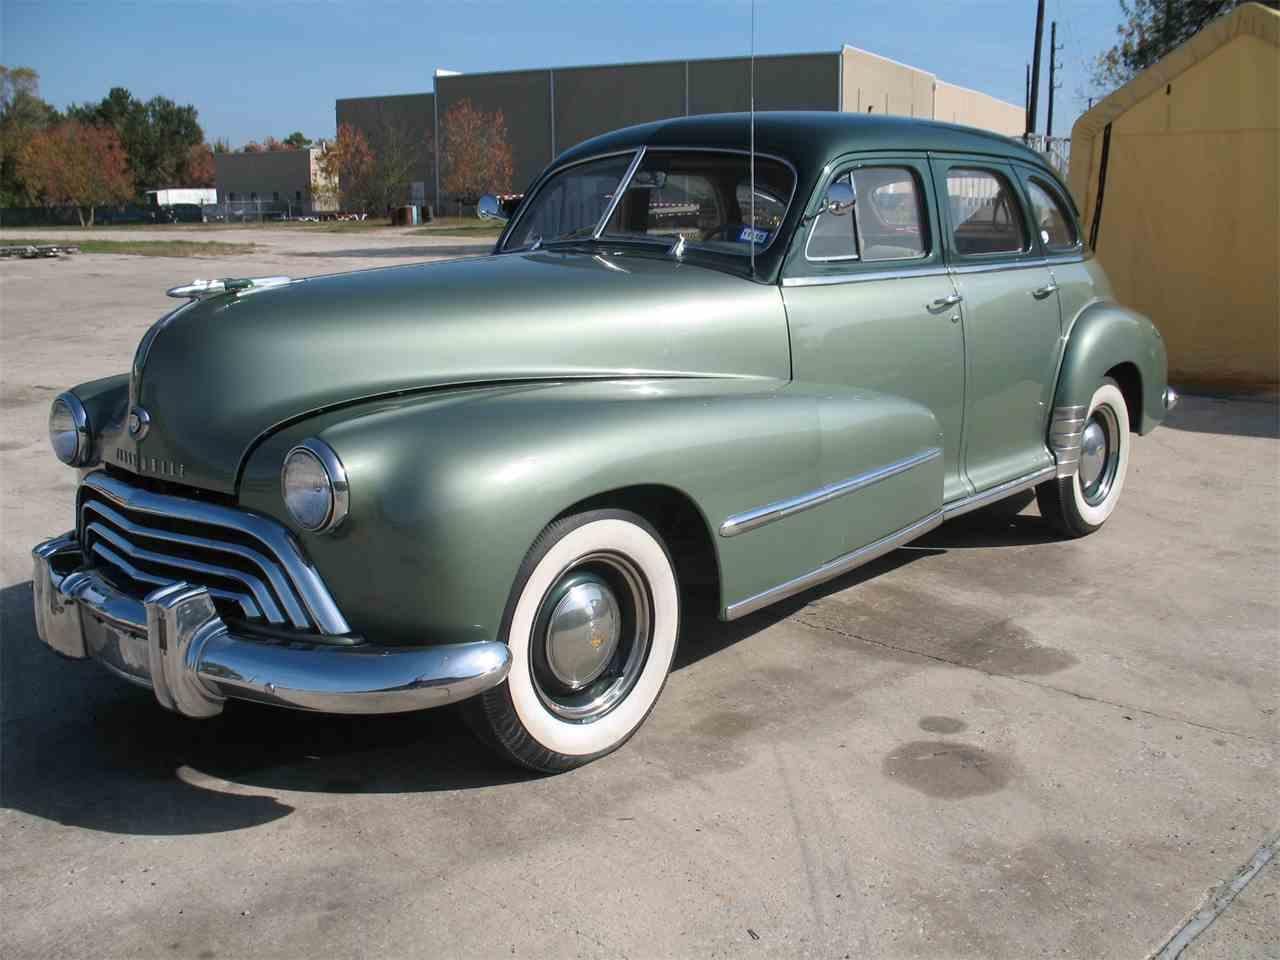 Classic Cars For Sale Houston Area: 1948 Oldsmobile Sedan For Sale